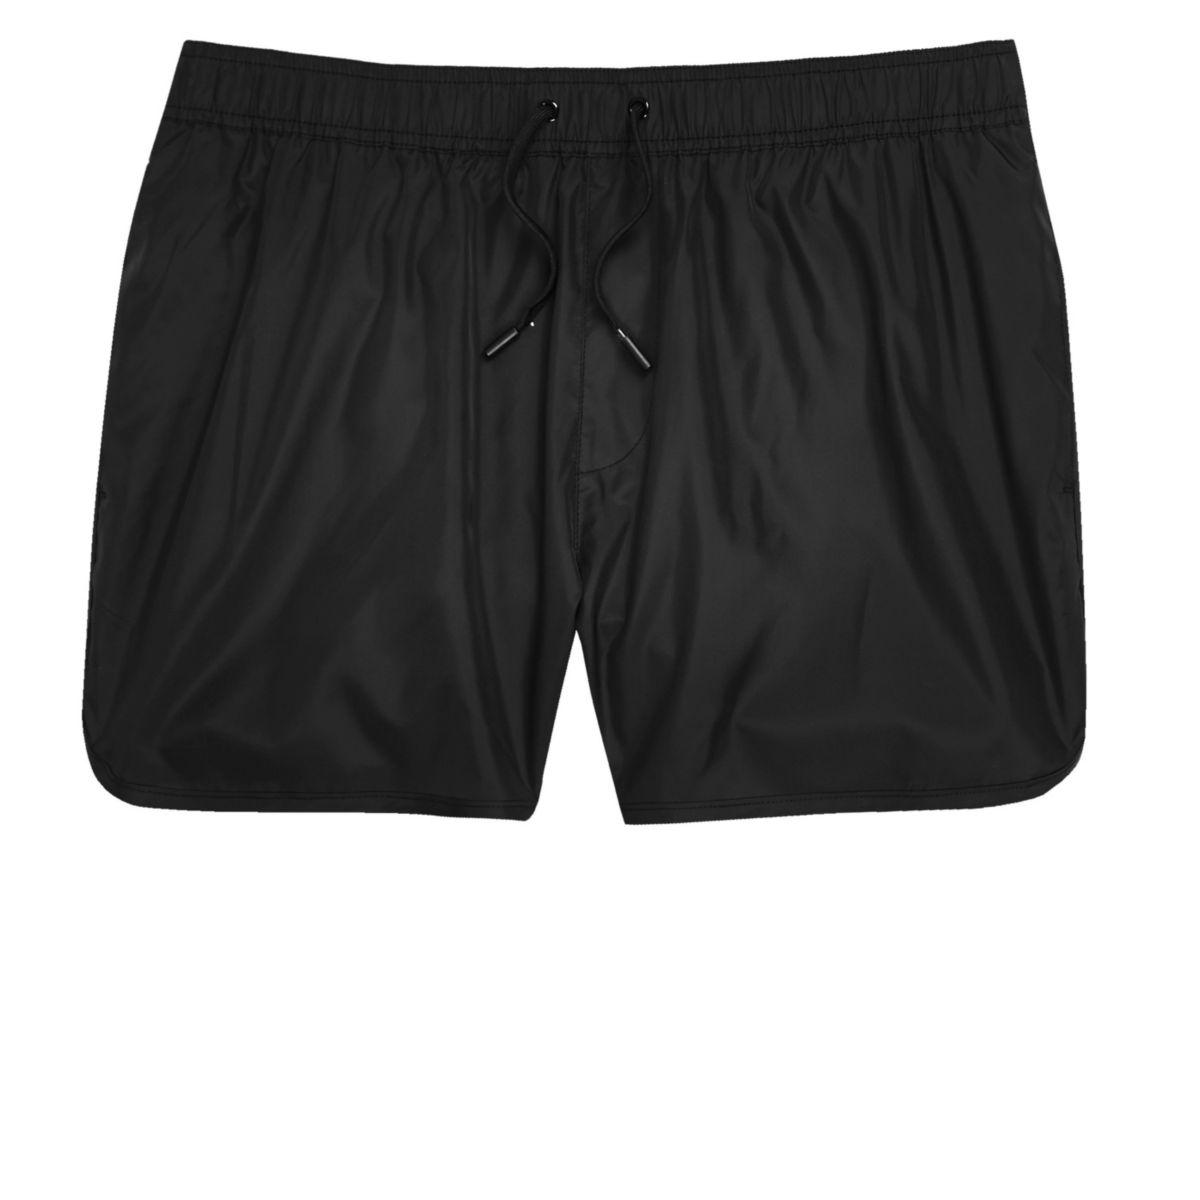 Big and Tall black short swim shorts